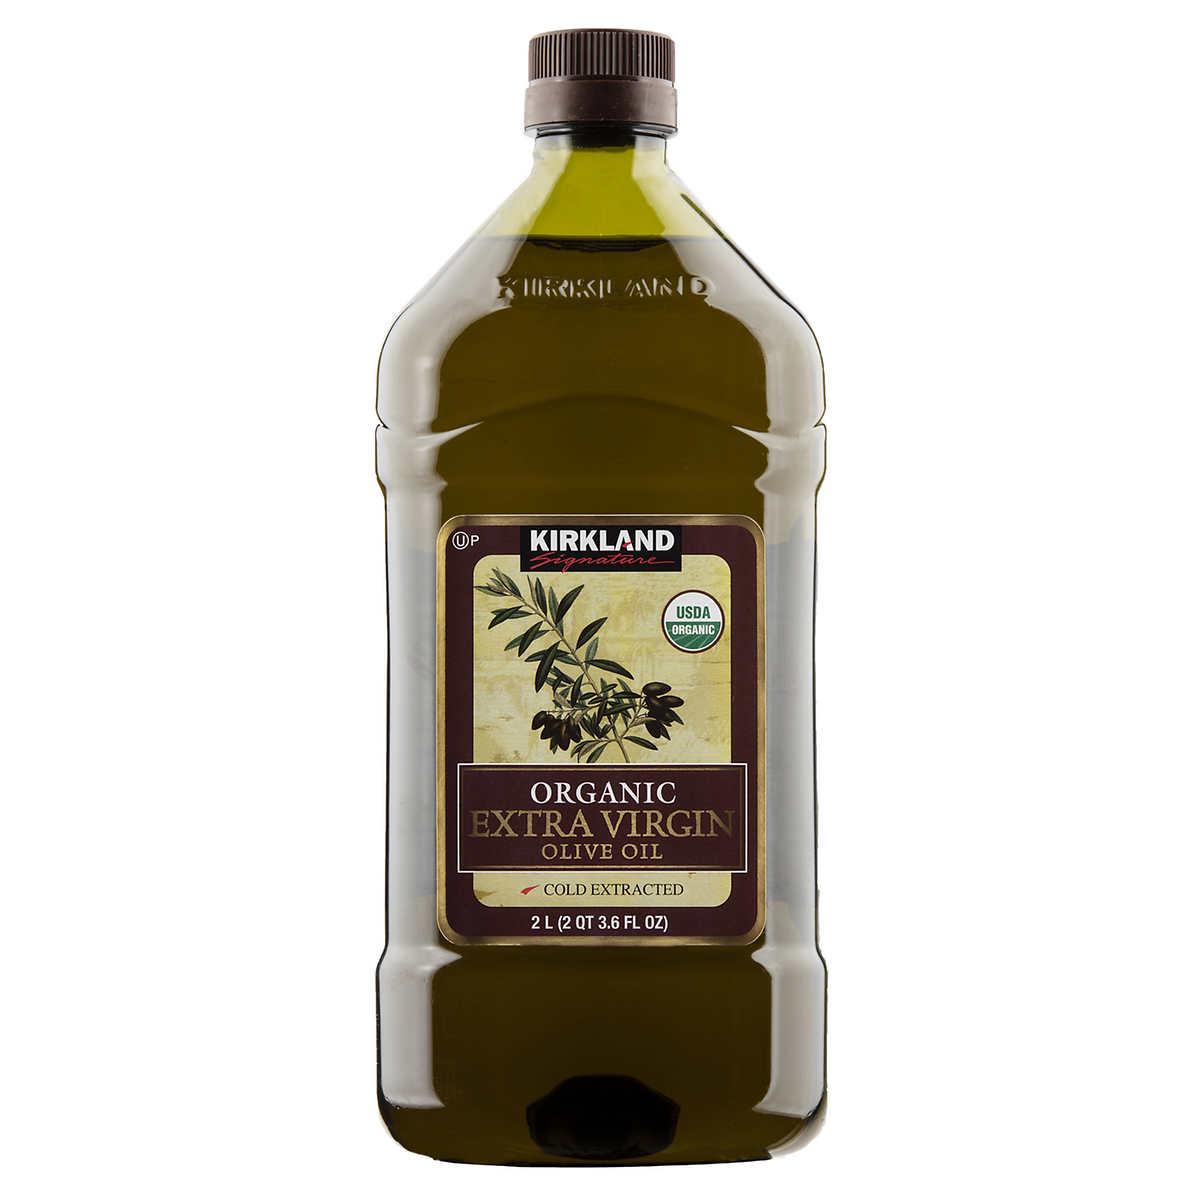 Kirkland Signature Organic Extra Virgin Olive Oil, 2 L